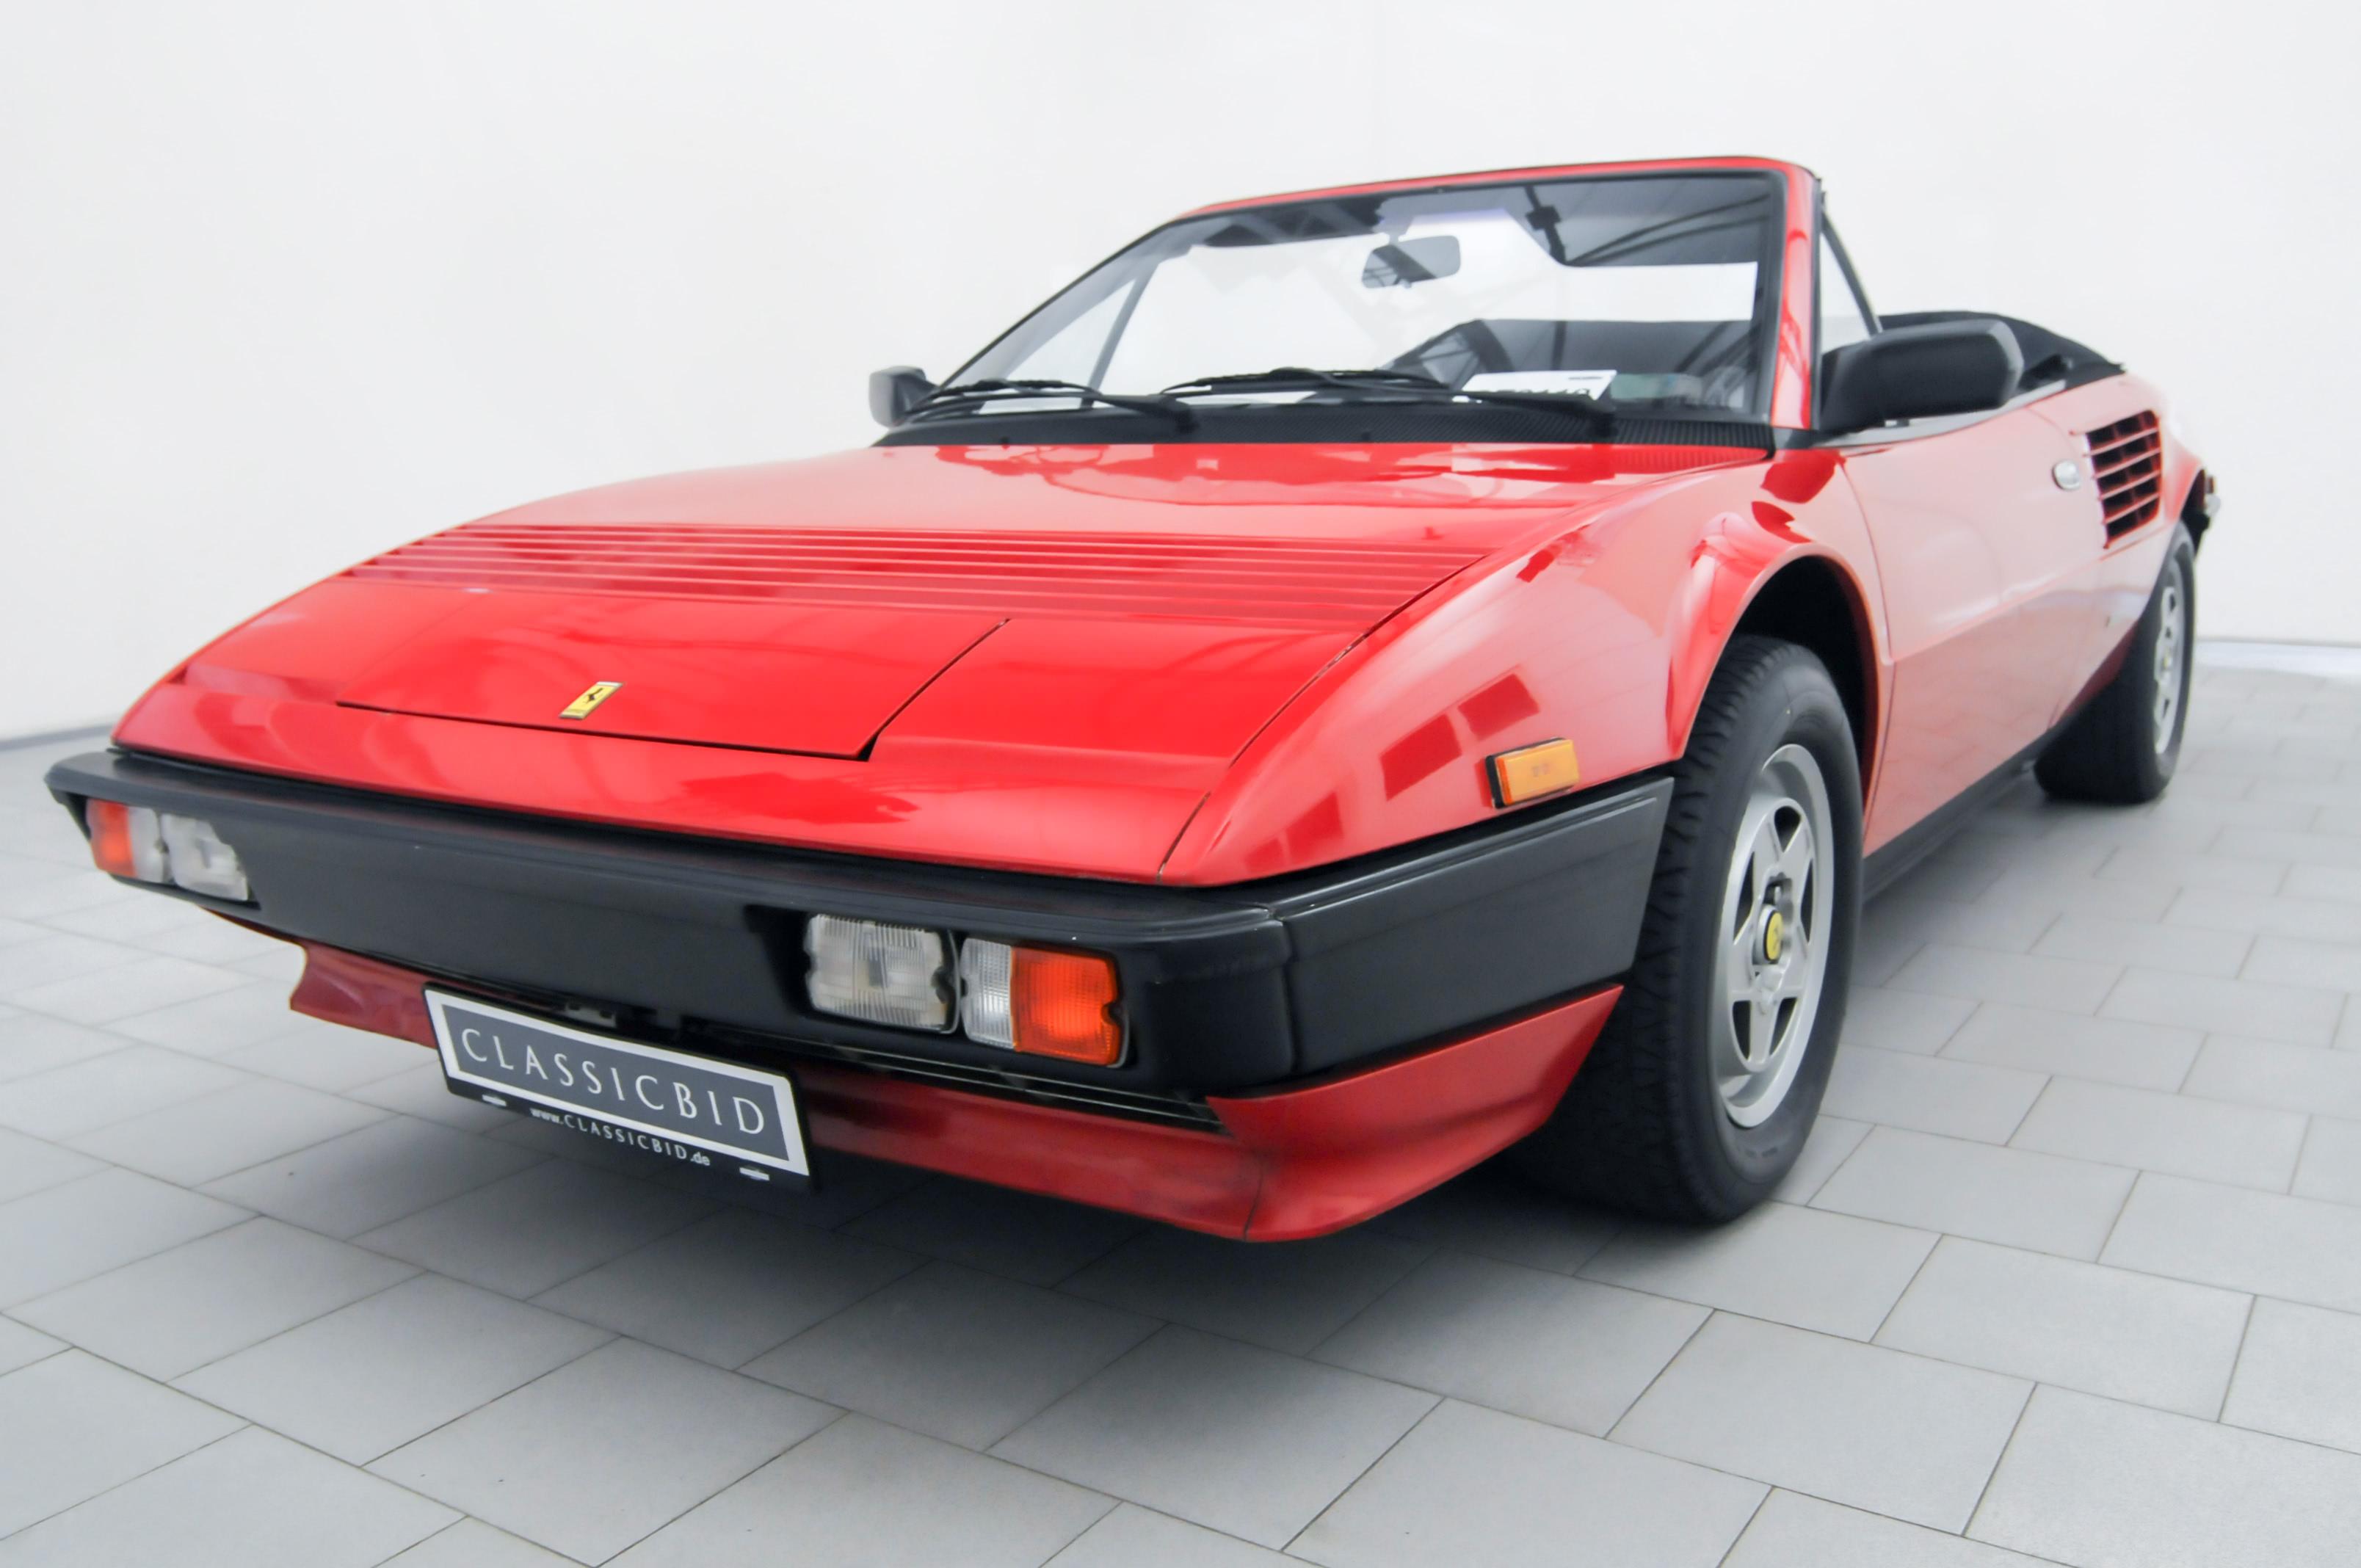 OT0119_01 Gorgeous Ferrari Mondial 3.2 Cabriolet V8 Quattrovalvole Cars Trend